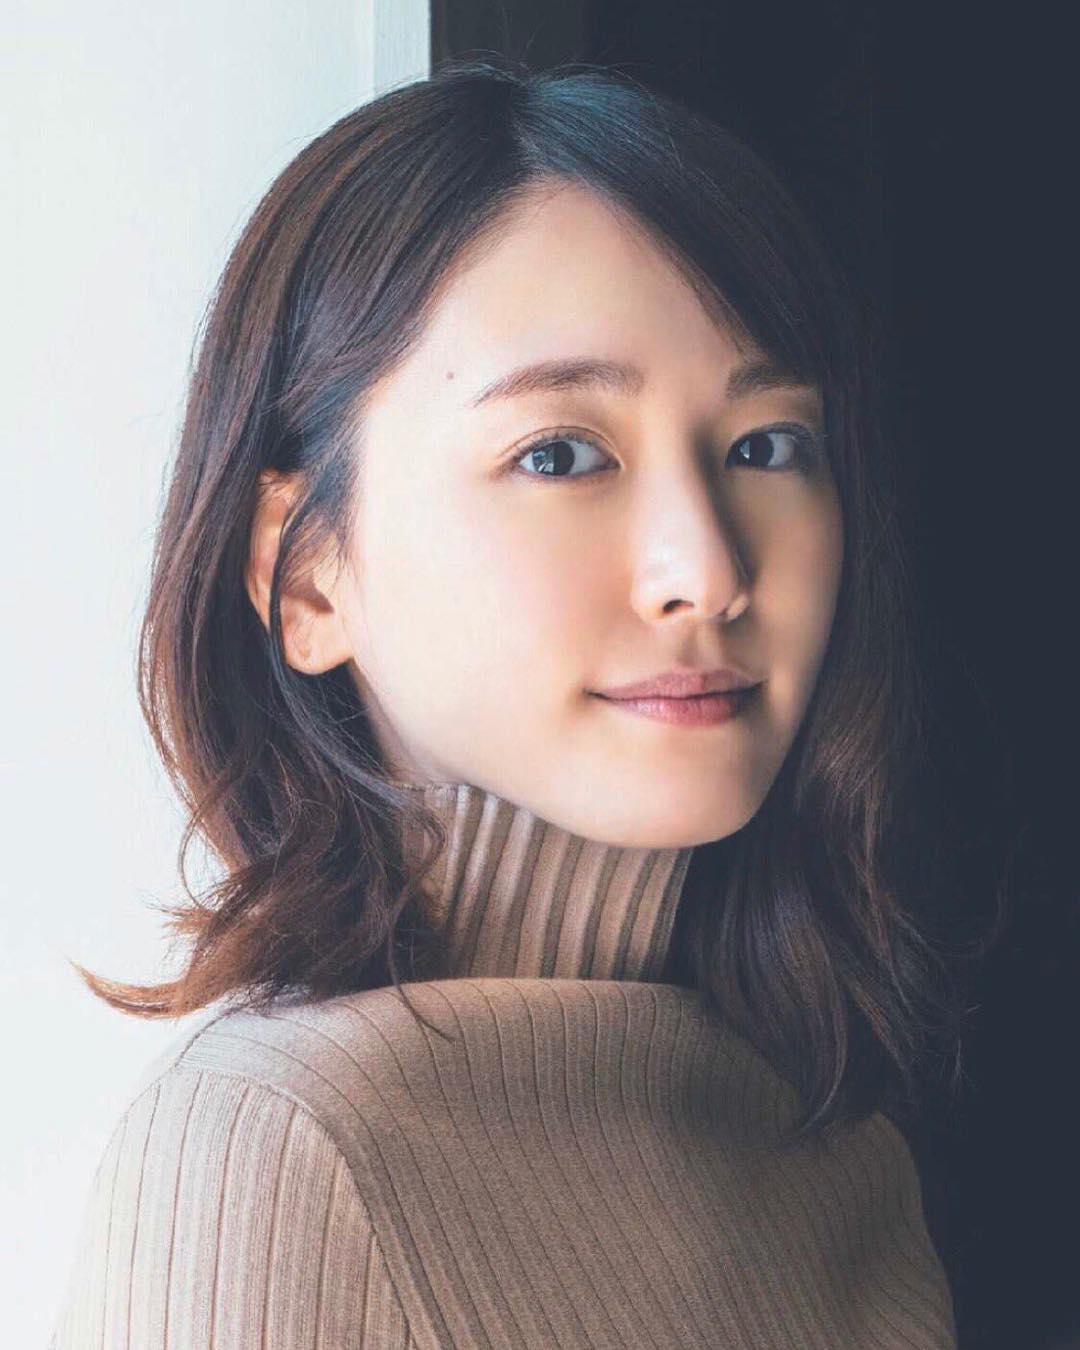 diễn viên nhật - aragaki nhật bản